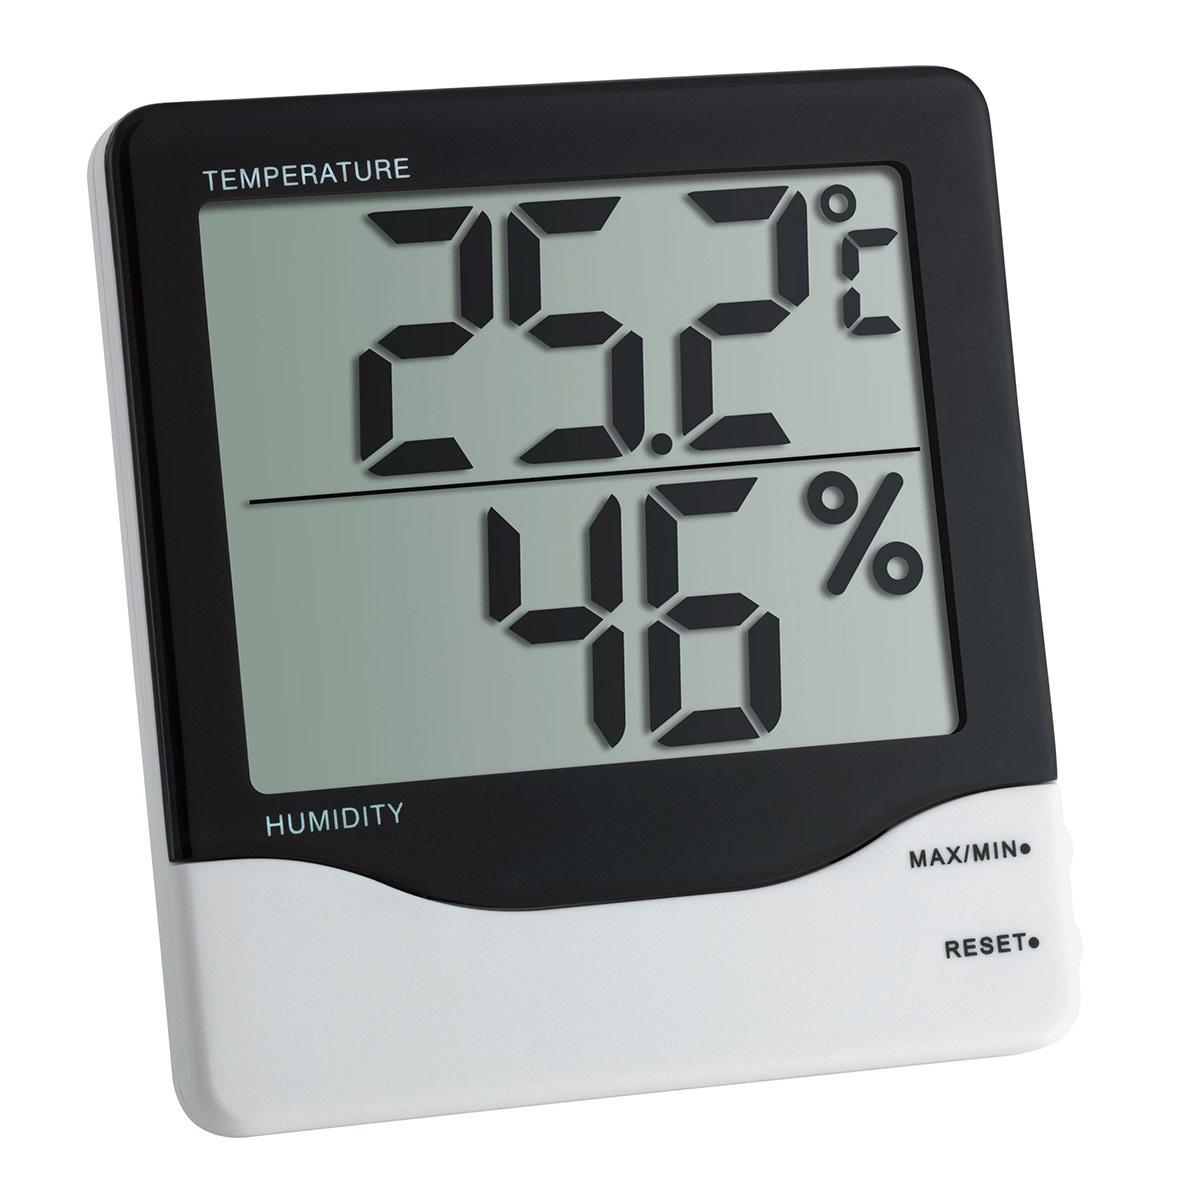 30-5002-digitales-thermo-hygrometer-1200x1200px.jpg